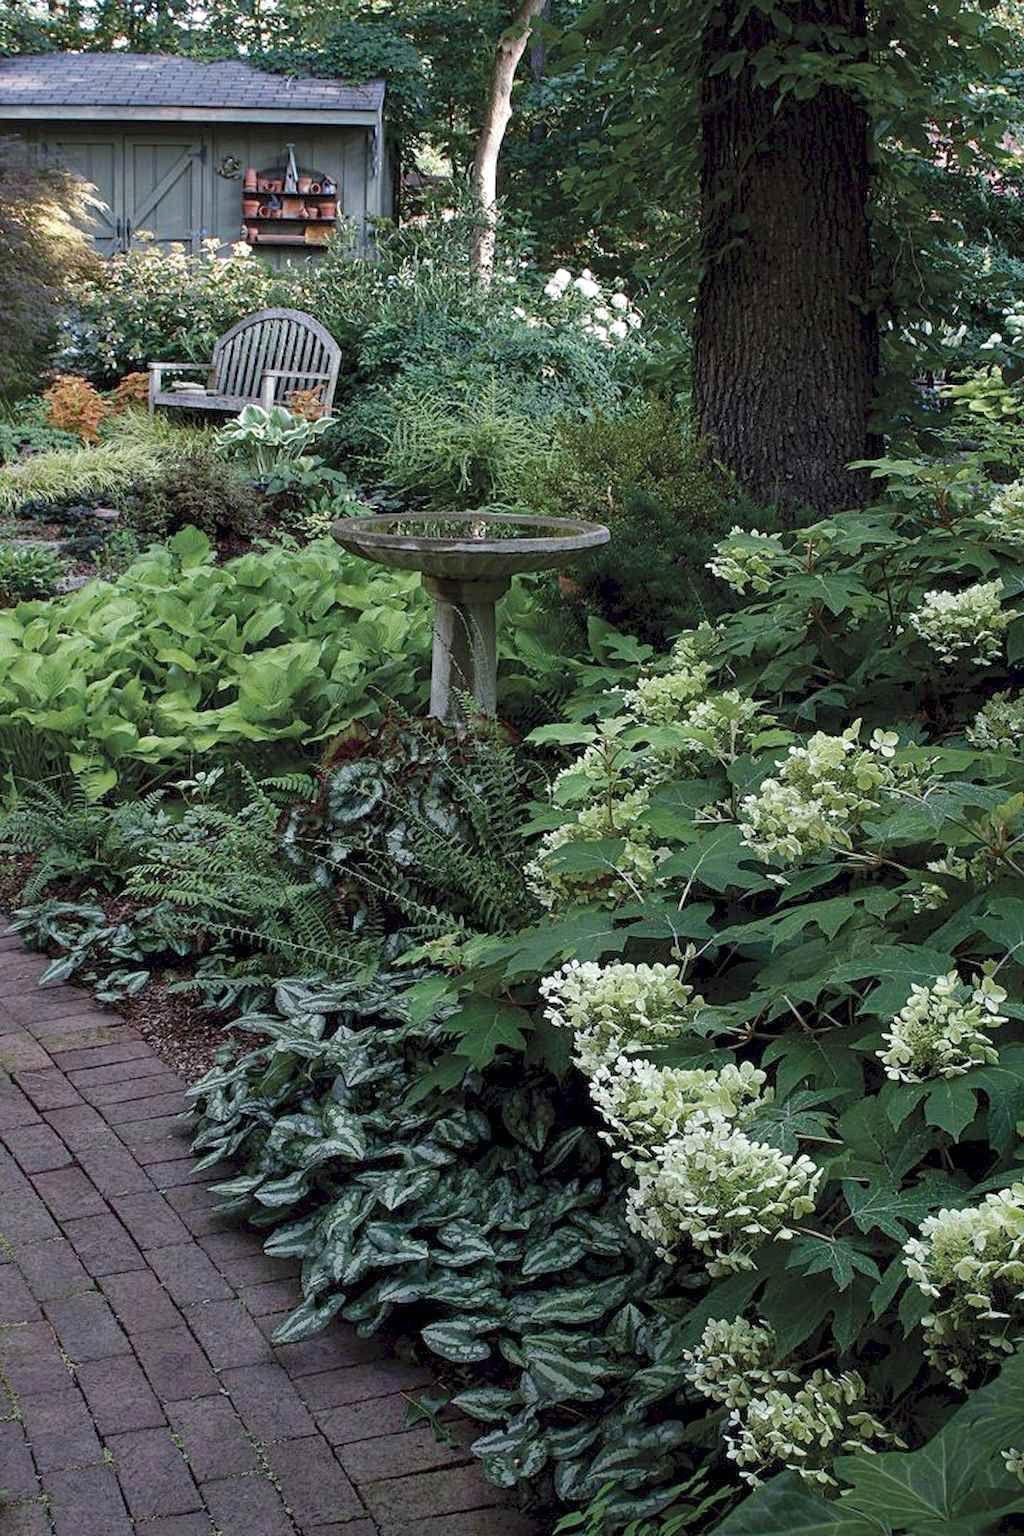 Favorite Side House Garden Landscaping Decoration Ideas With Rocks Exp Decor Shade Garden Design Cottage Garden Backyard Landscaping Backyard shade house ideas